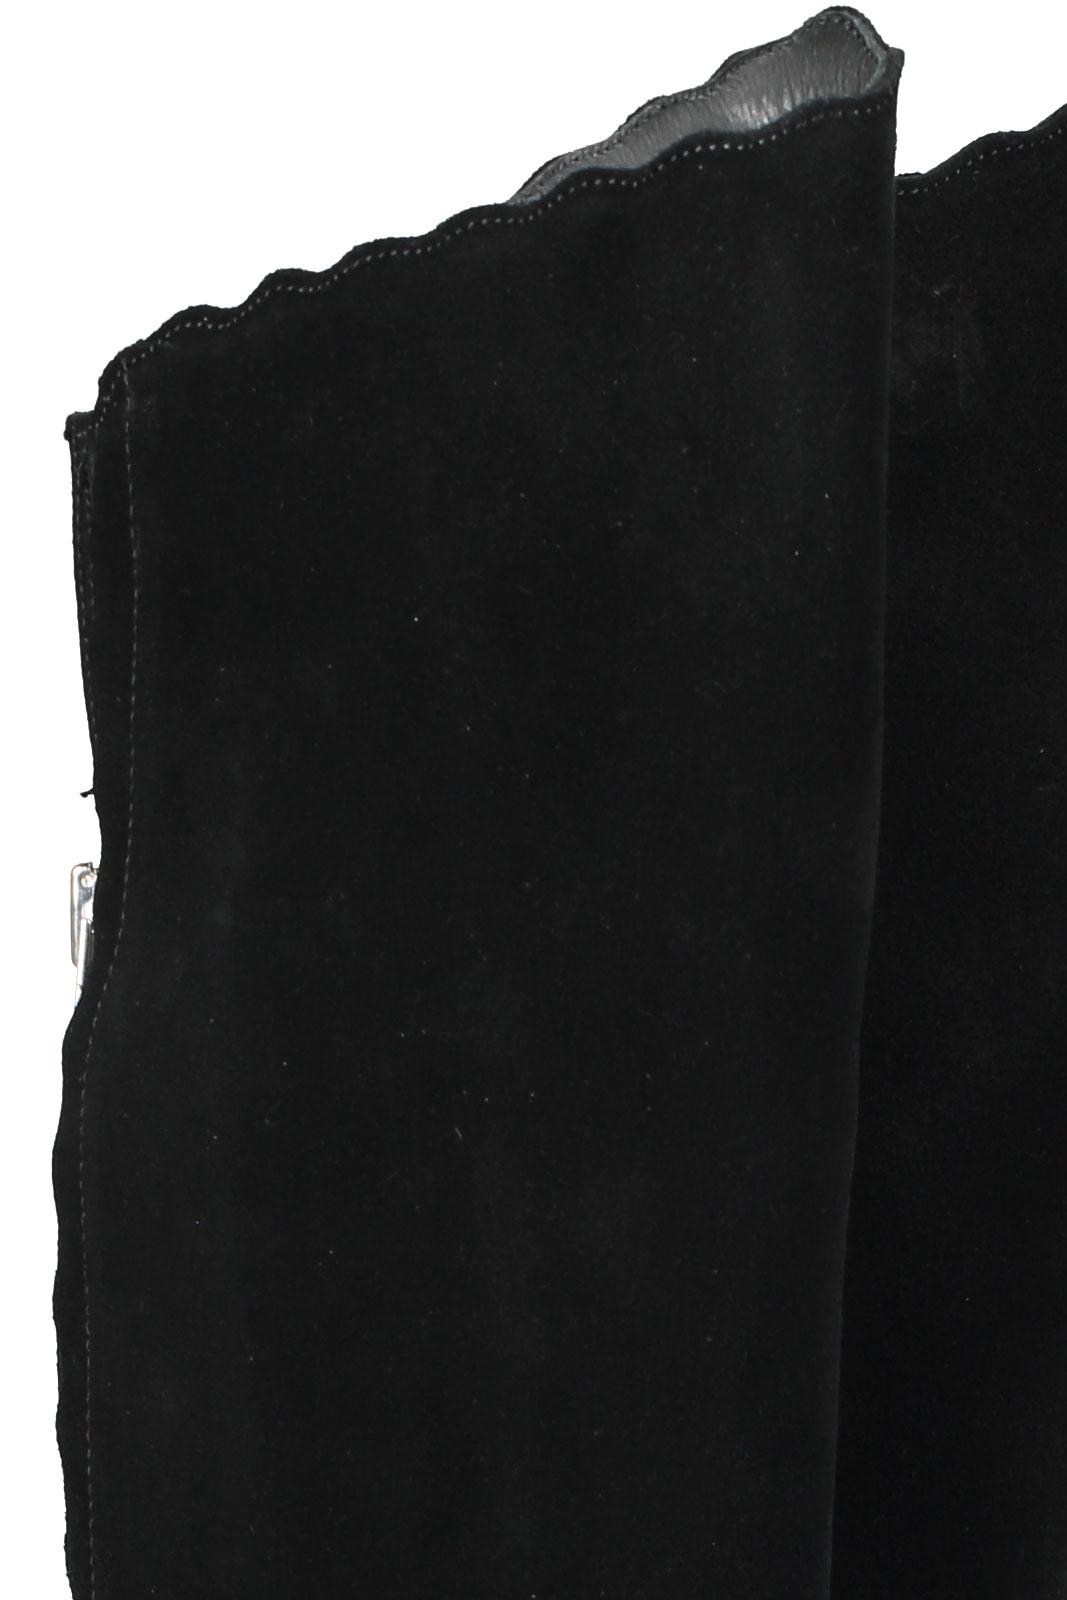 PRIMEBOOTS | Claudia X High 527 Afelp Black | SKOR NYHETER